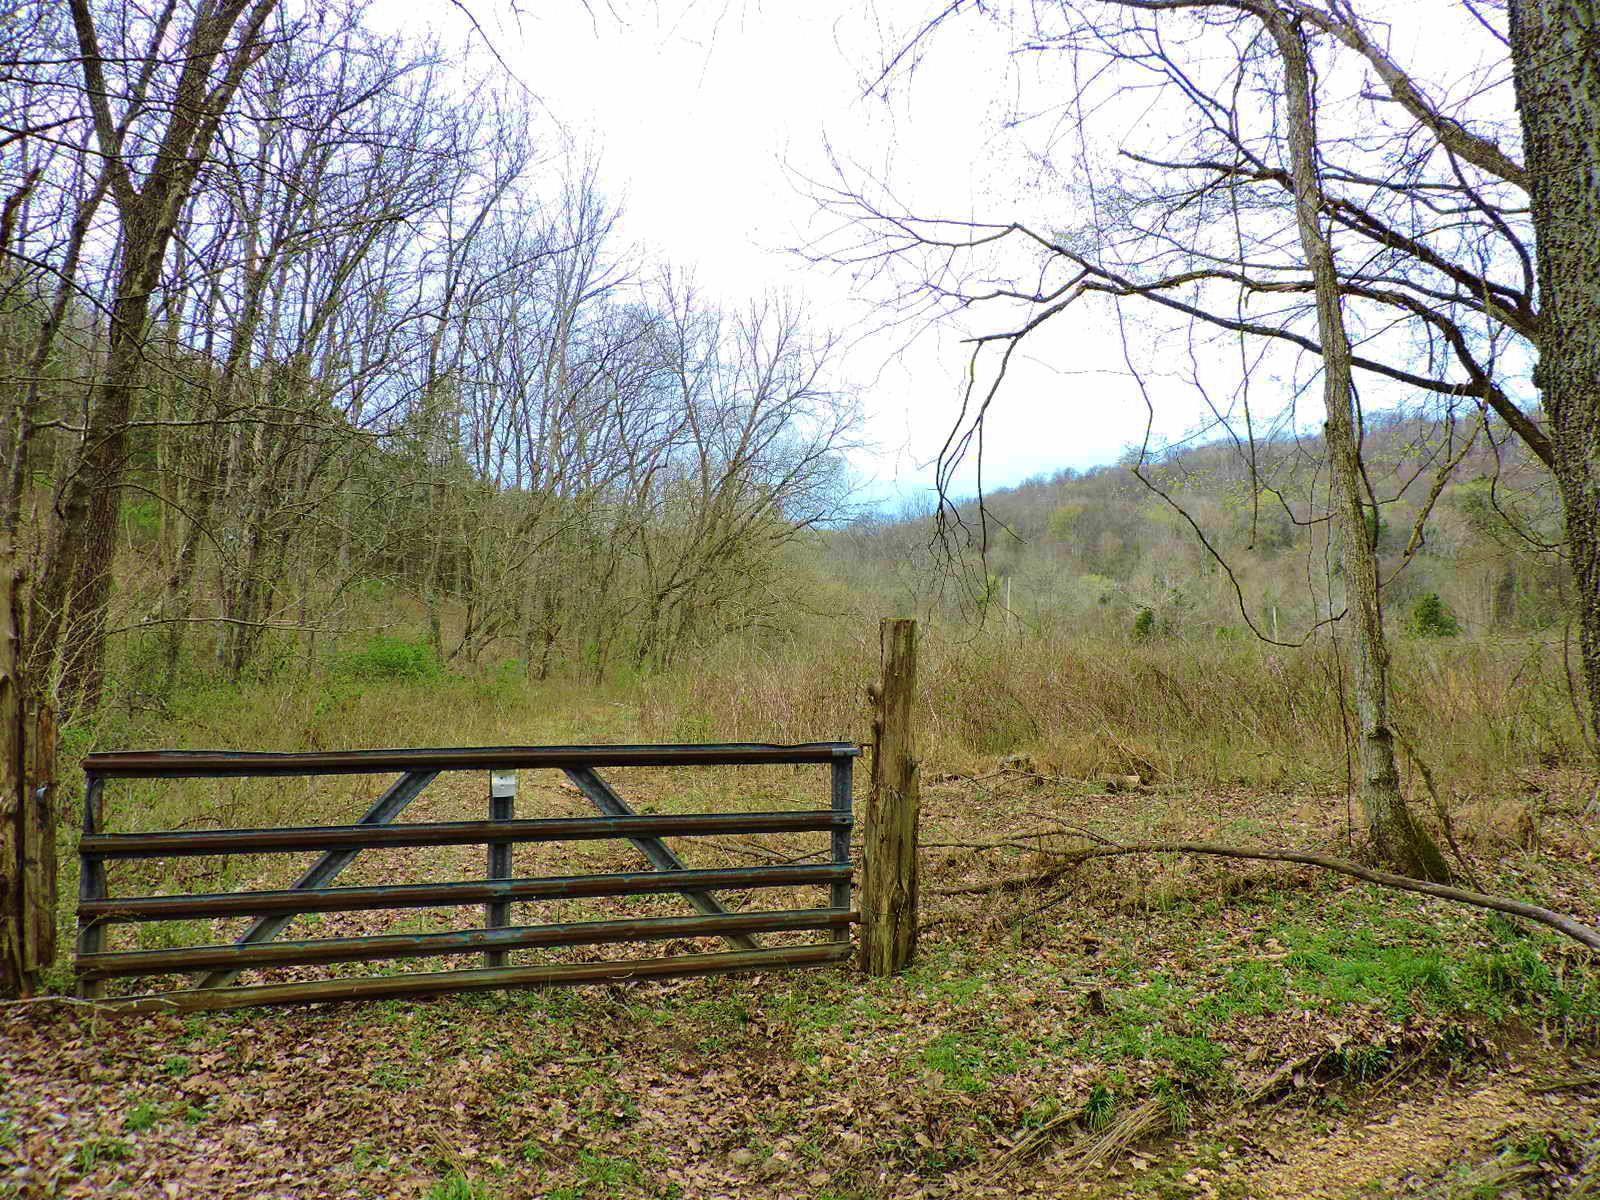 0 Barnetts Campground Ln, Gordonsville, TN 38563 - Gordonsville, TN real estate listing